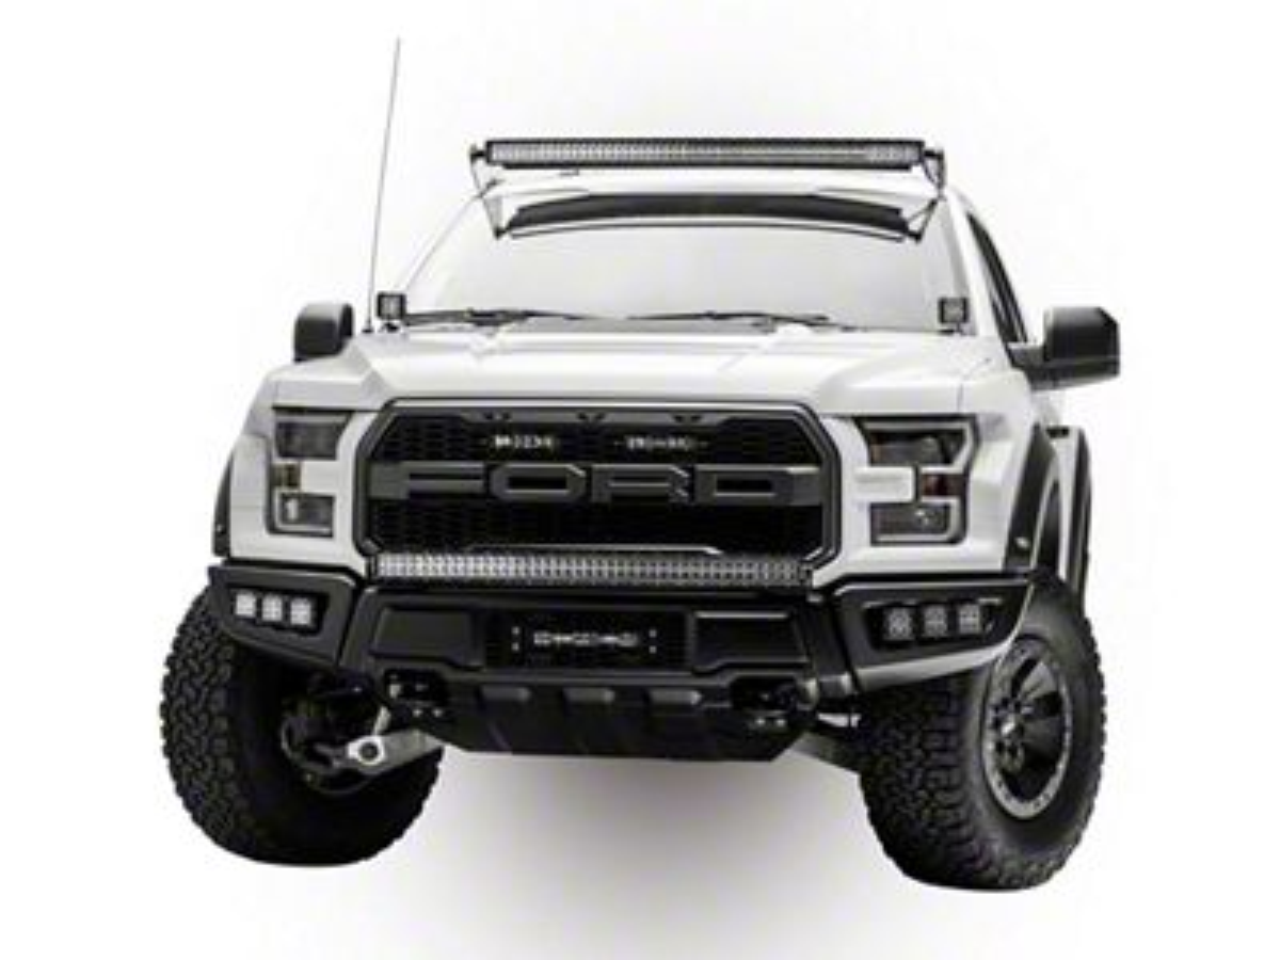 ZRoadz Two 6 in. LED Light Bars w/ Mounting Brackets for OEM Grille (17-19 F-150 Raptor)